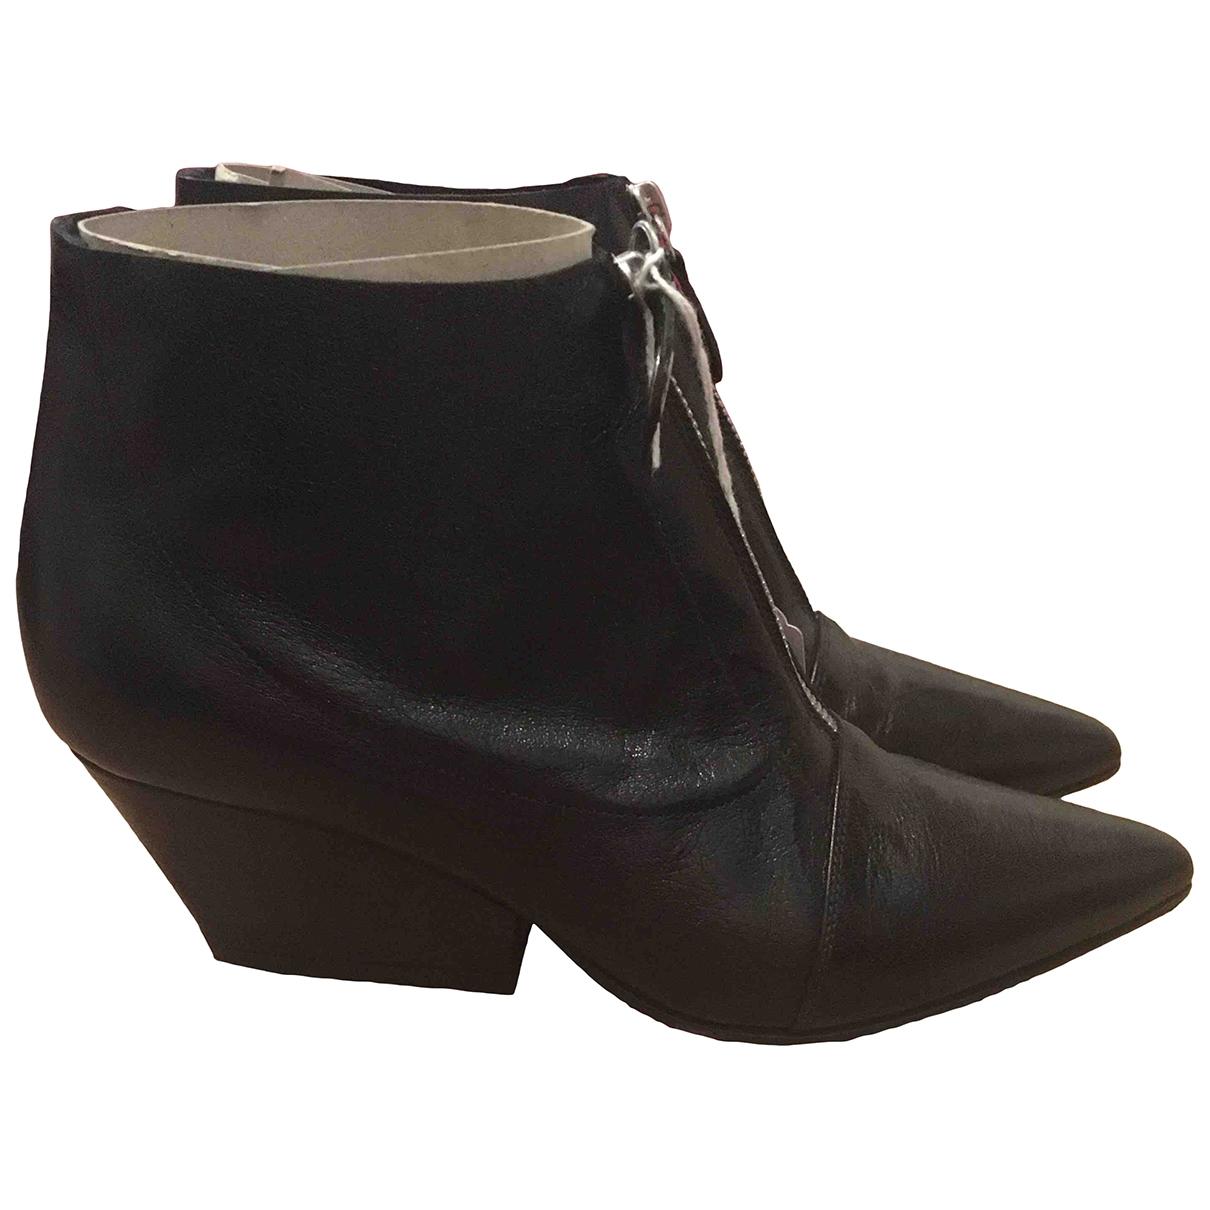 Lella Baldi \N Black Leather Ankle boots for Women 37 EU